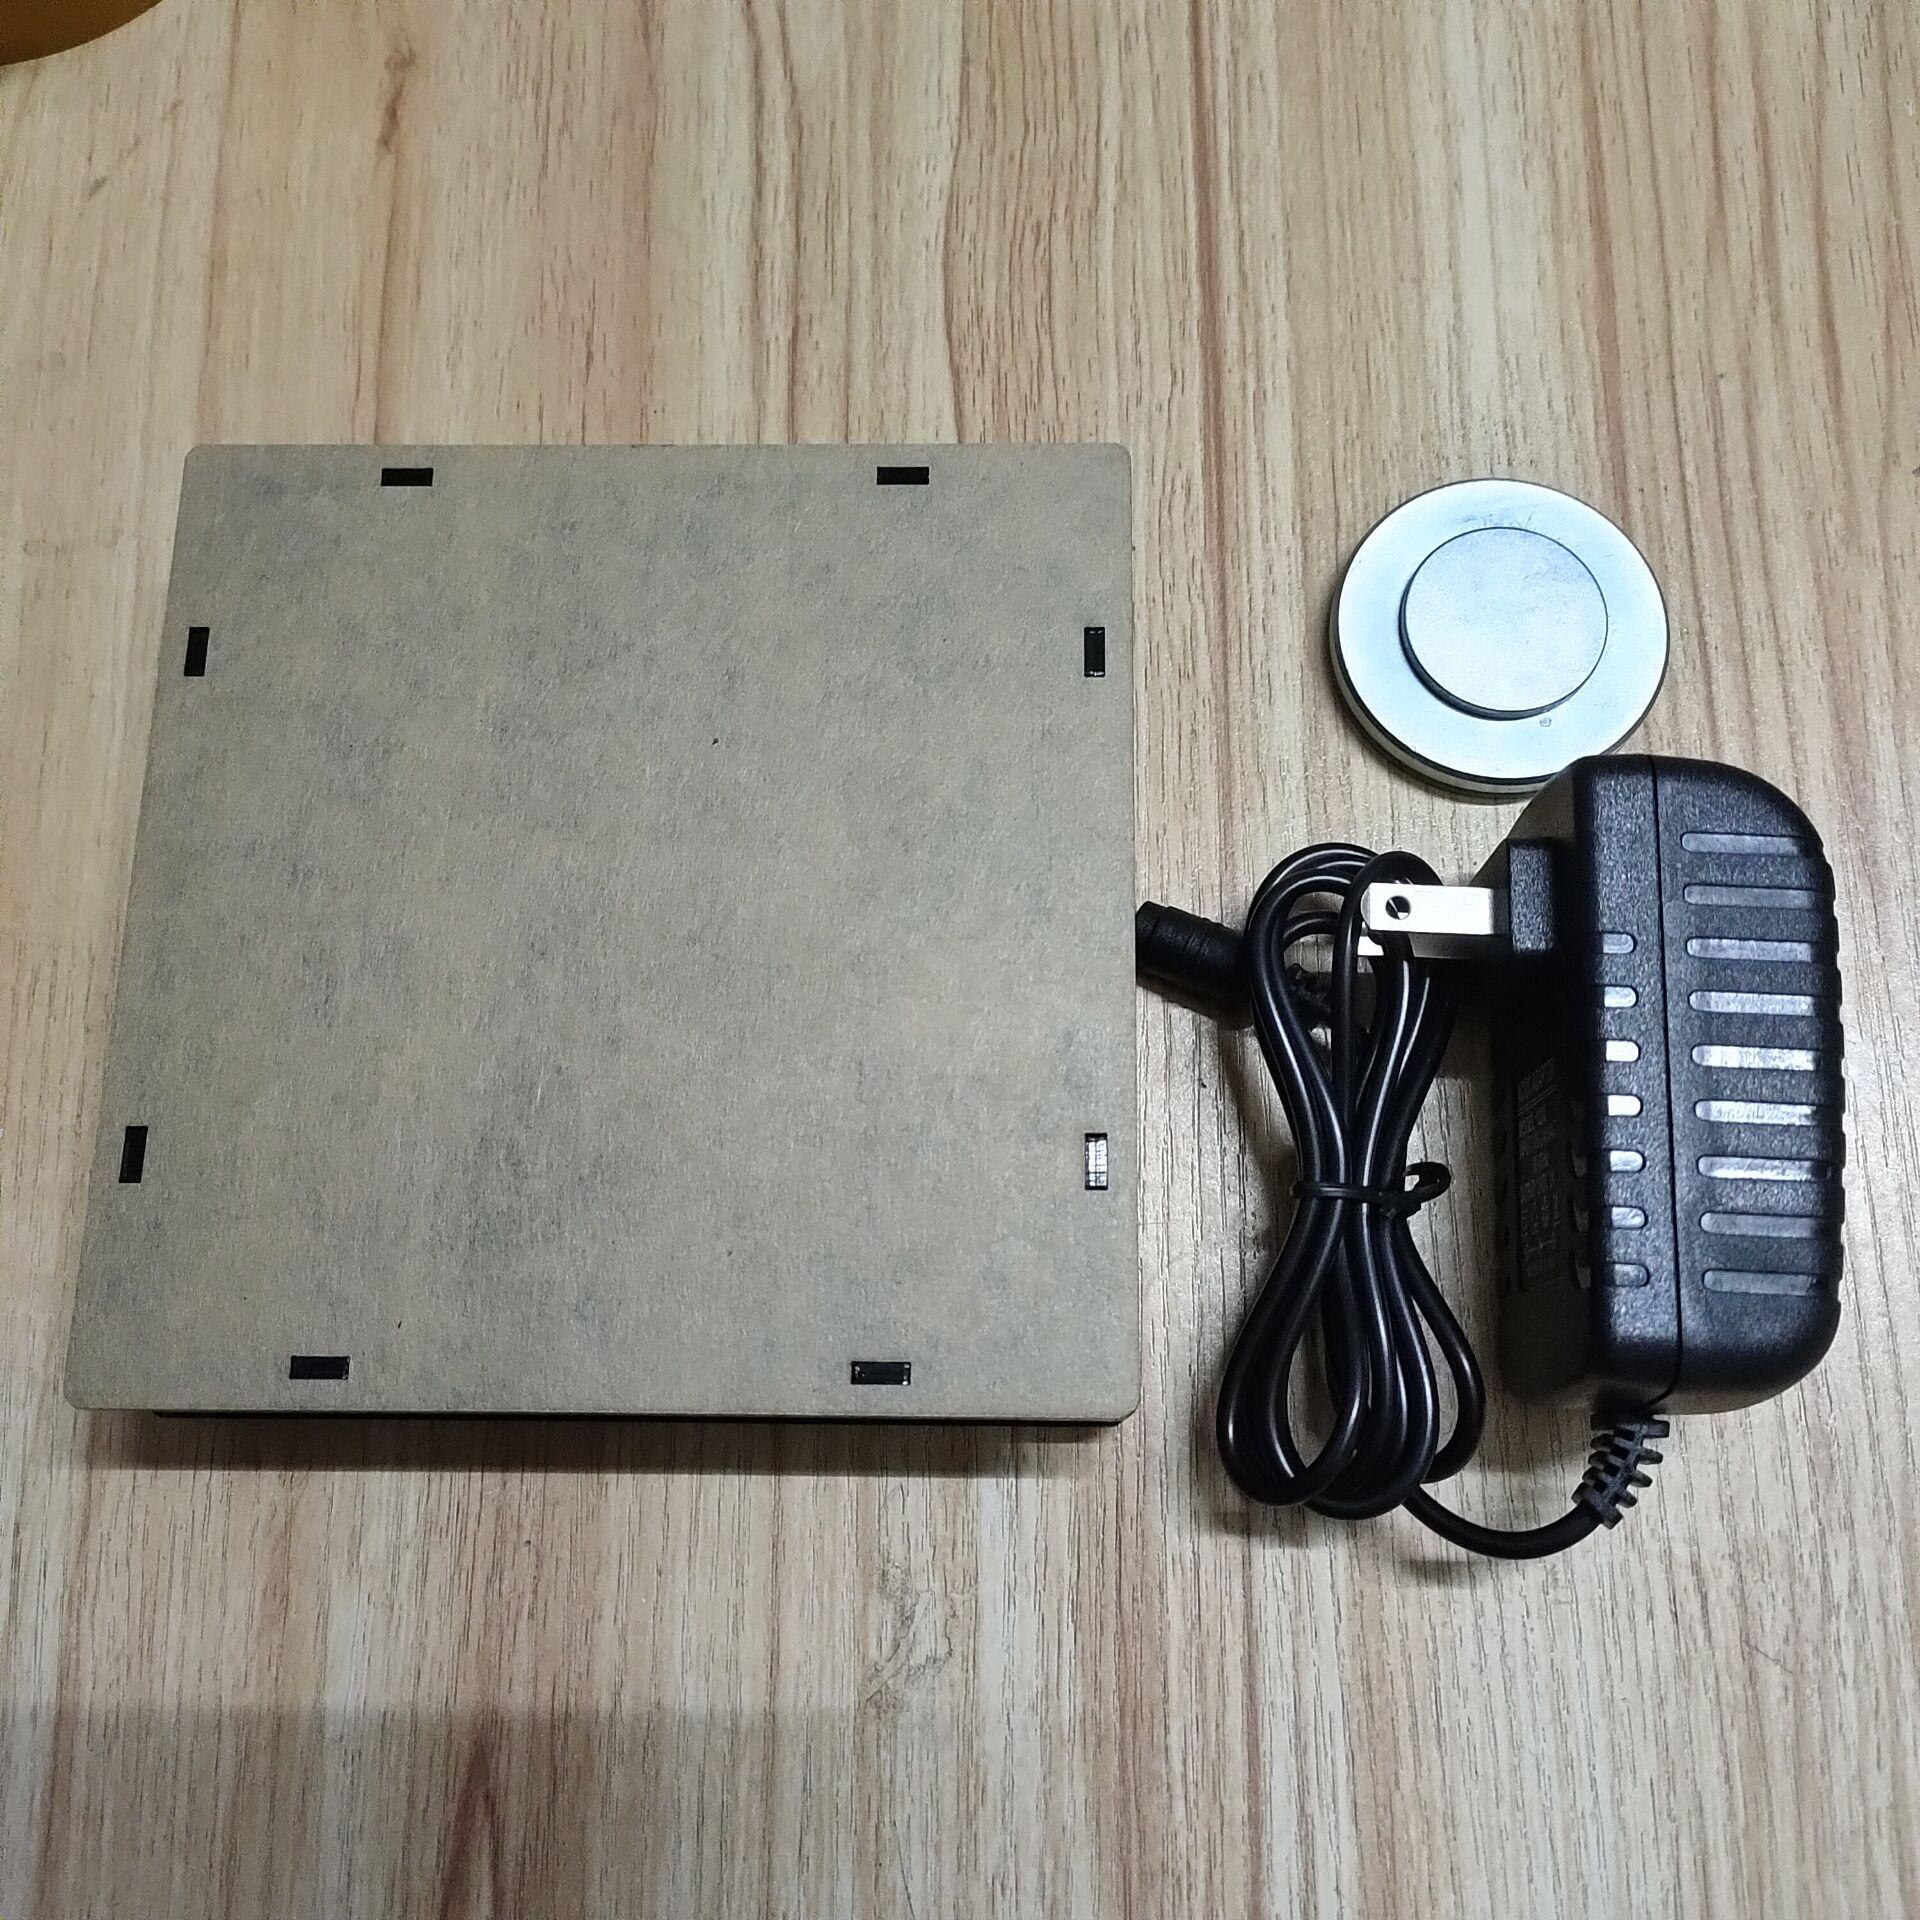 DIY 500g magnetic levitation module magnetic levitation platform power supply